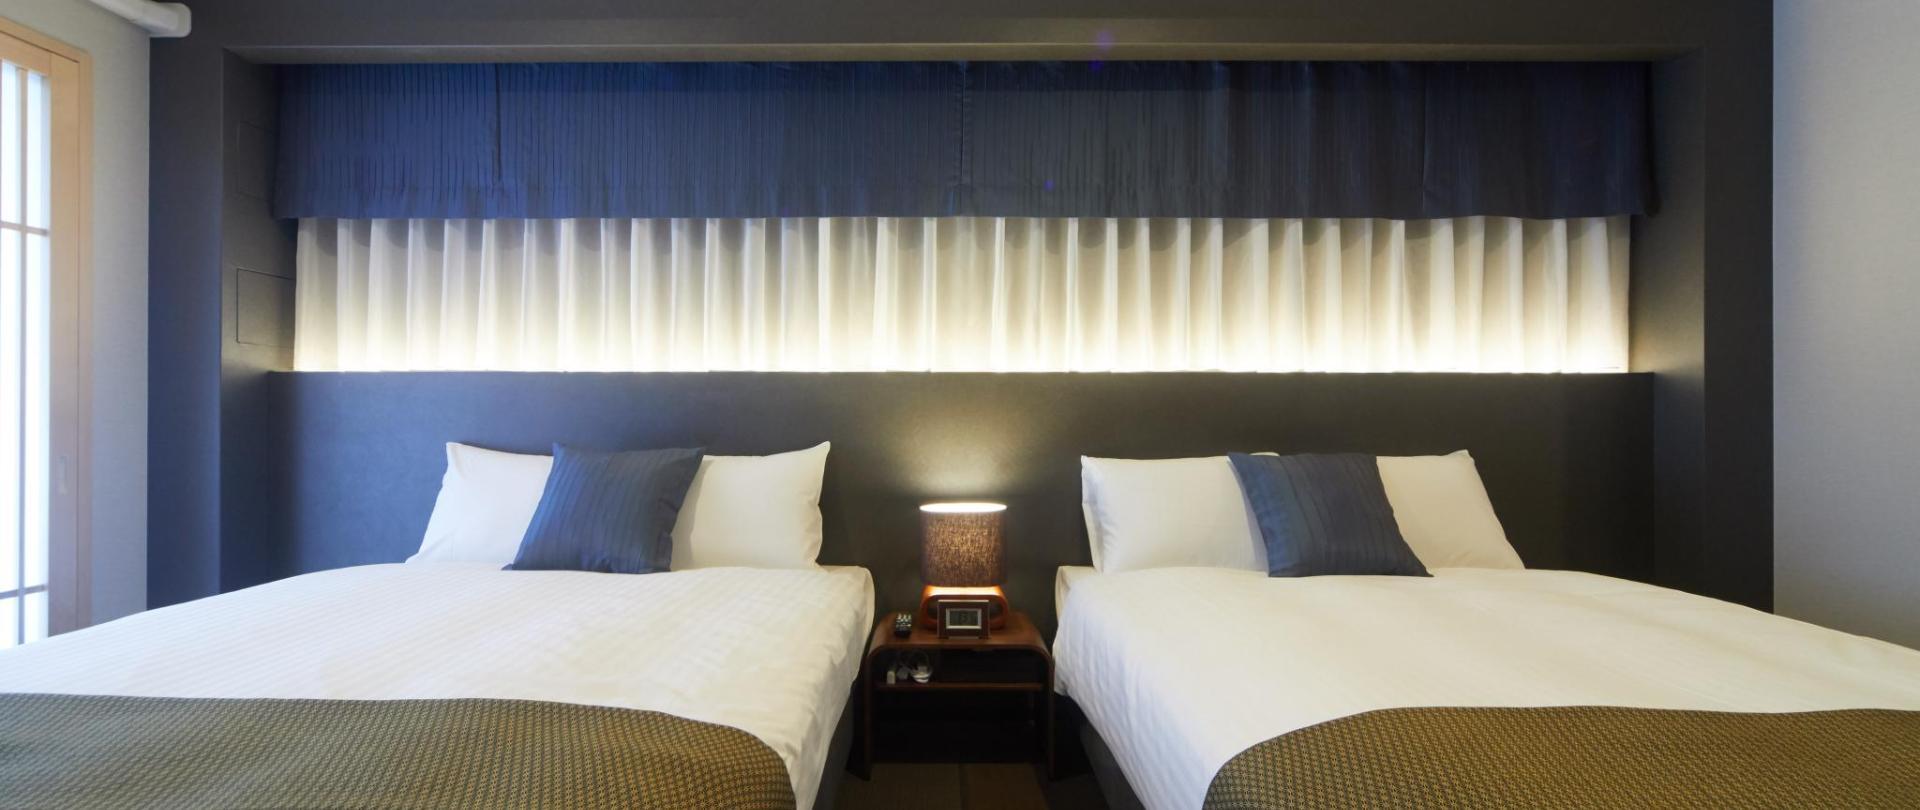 181217_HotelMondonce_145.jpg